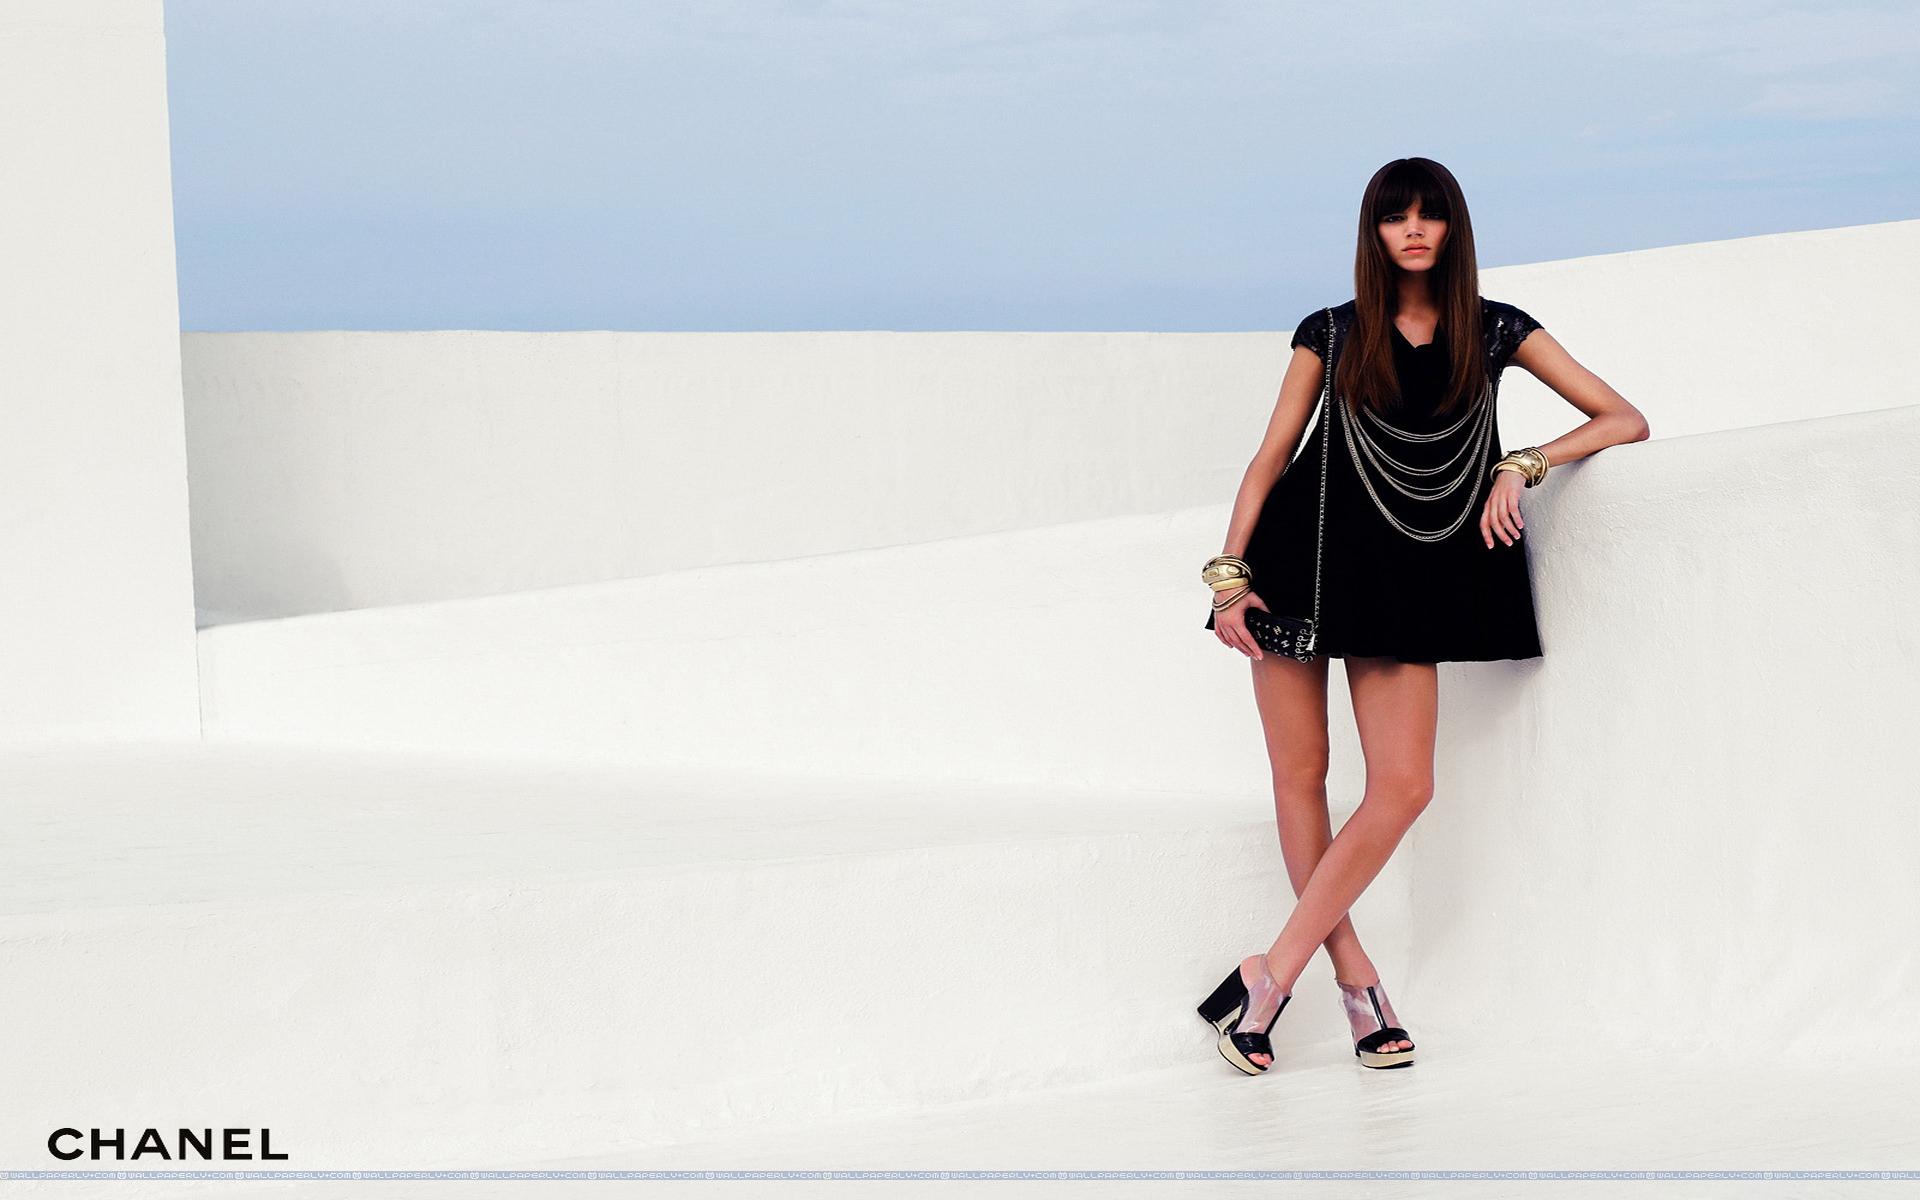 Fashion Desktop Wallpaper - WallpaperSafari